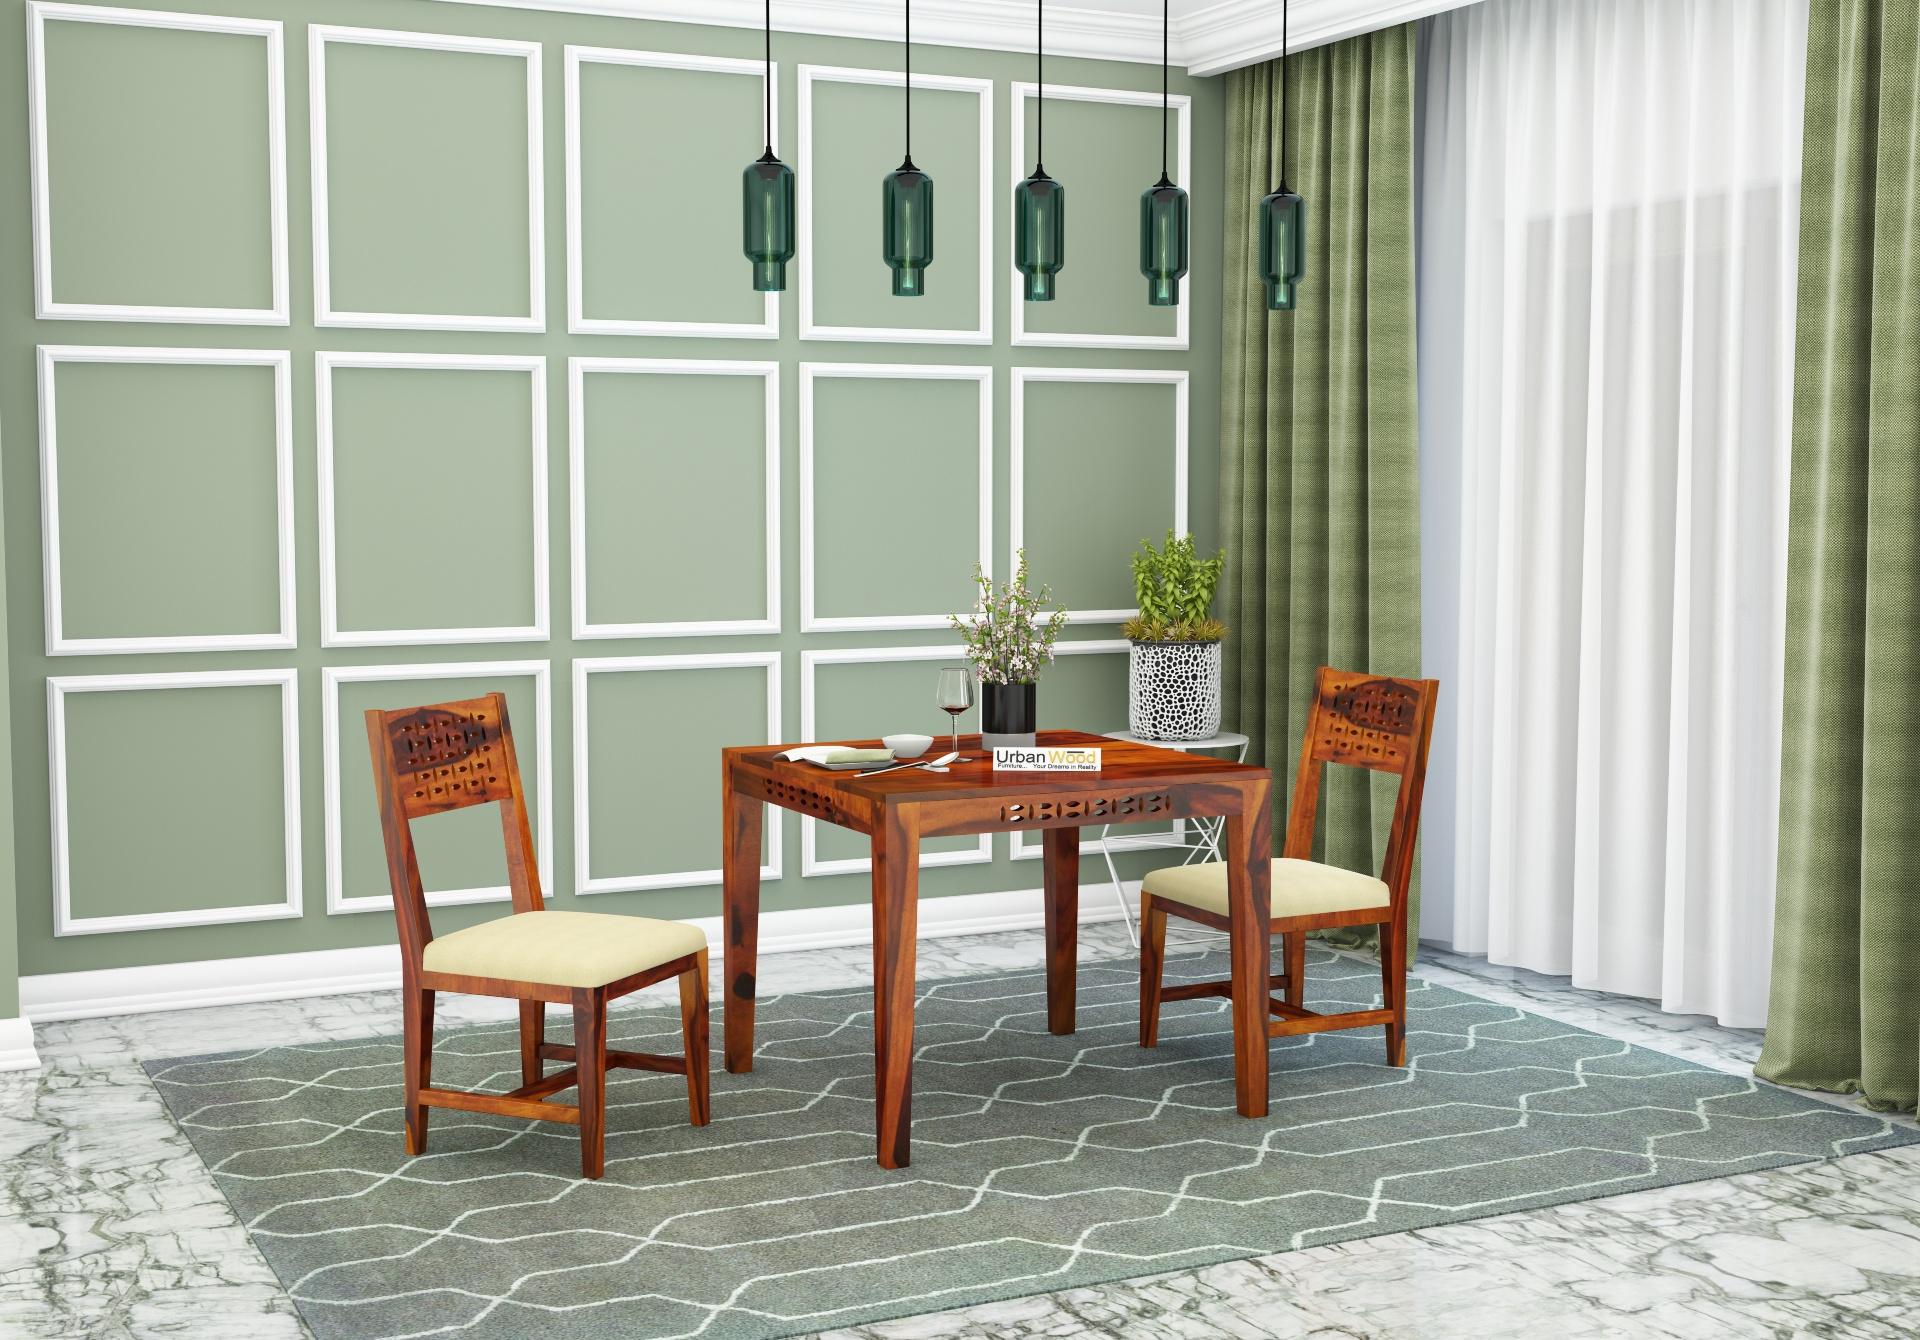 Woodora 2 Seater Dining Set With Cushion <small>(Honey Finish)</small>